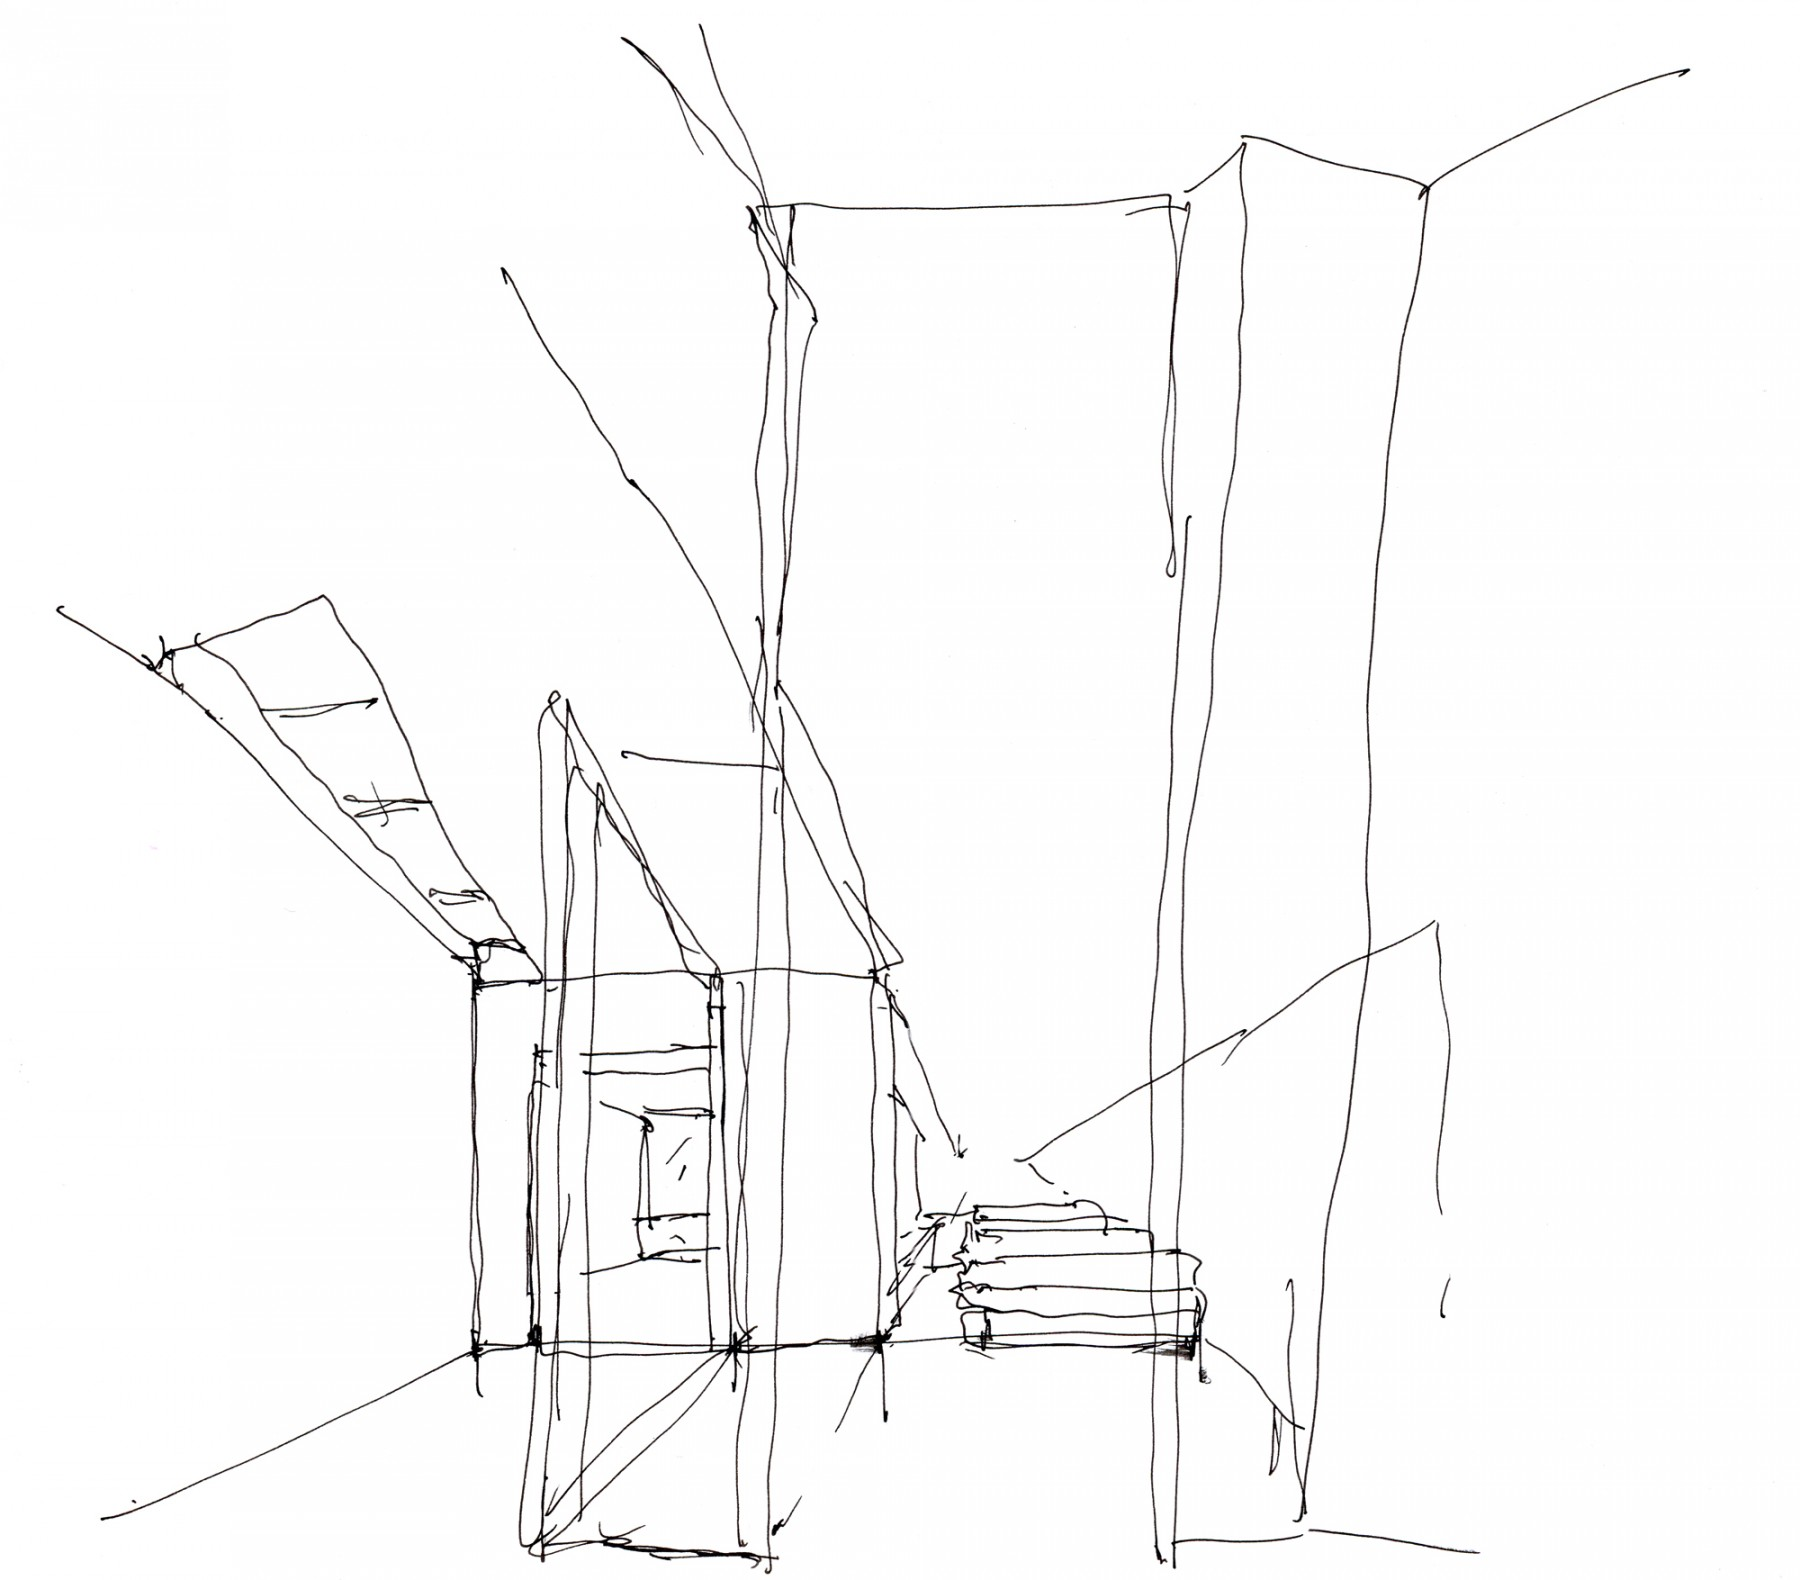 Kander-house-Primrose-hill-London-residential-home-contemporary-interior-Riba-award-victorian-Jamie-Fobert-Architects-sketch